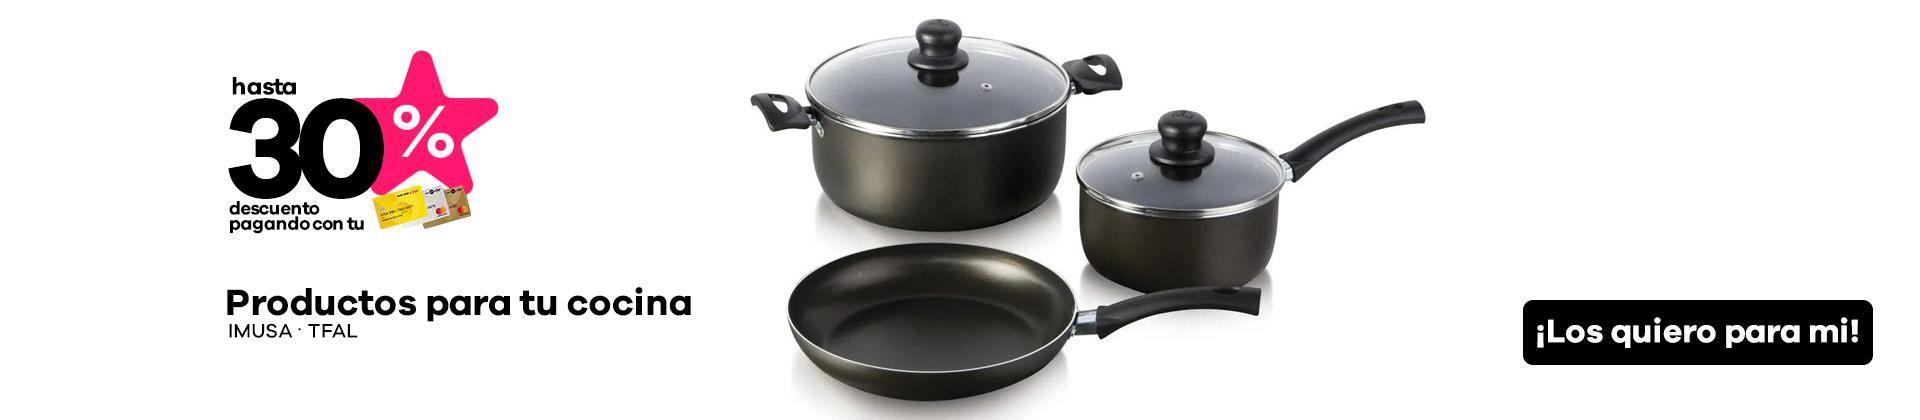 productos-para-tu-cocina-imusa-tfal